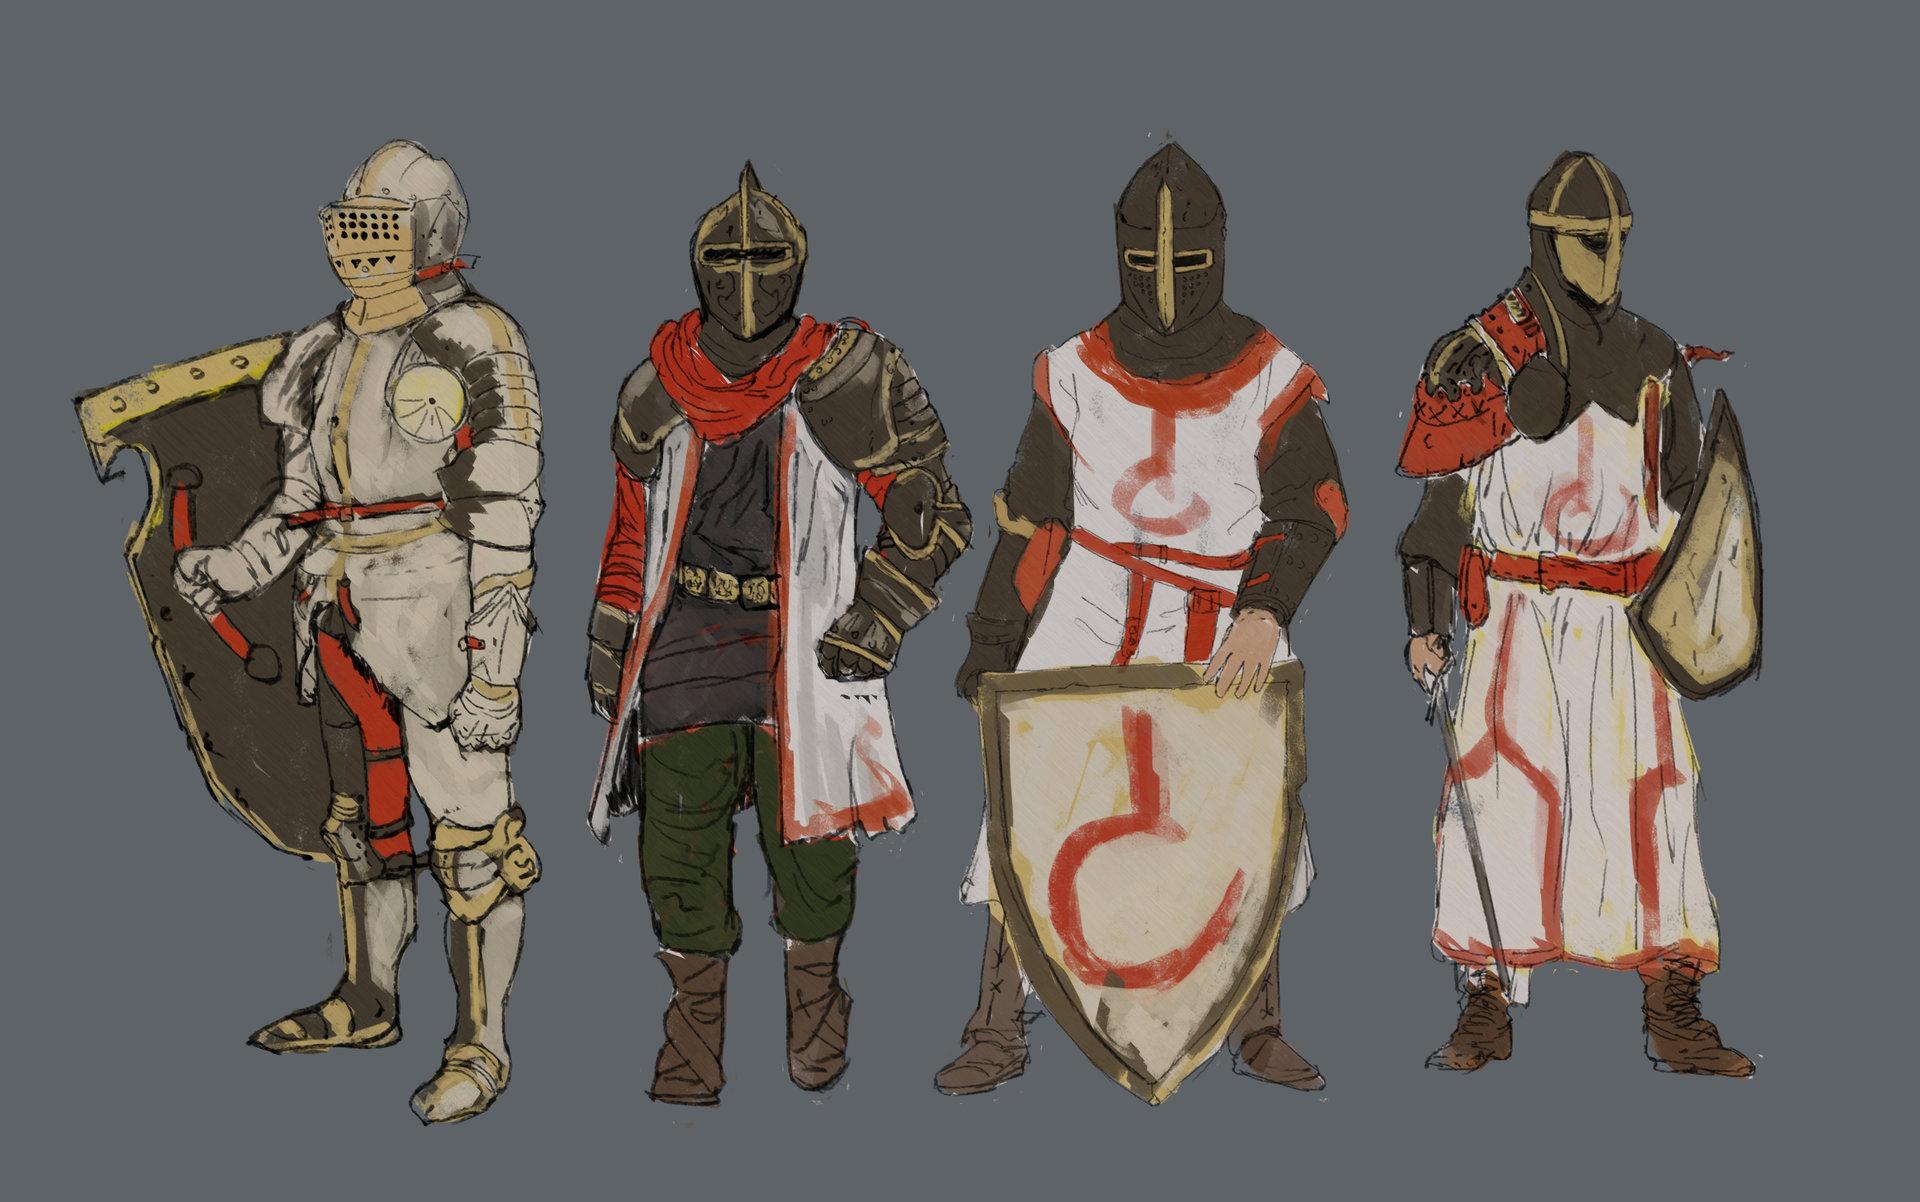 Konrad langa knights sketchez